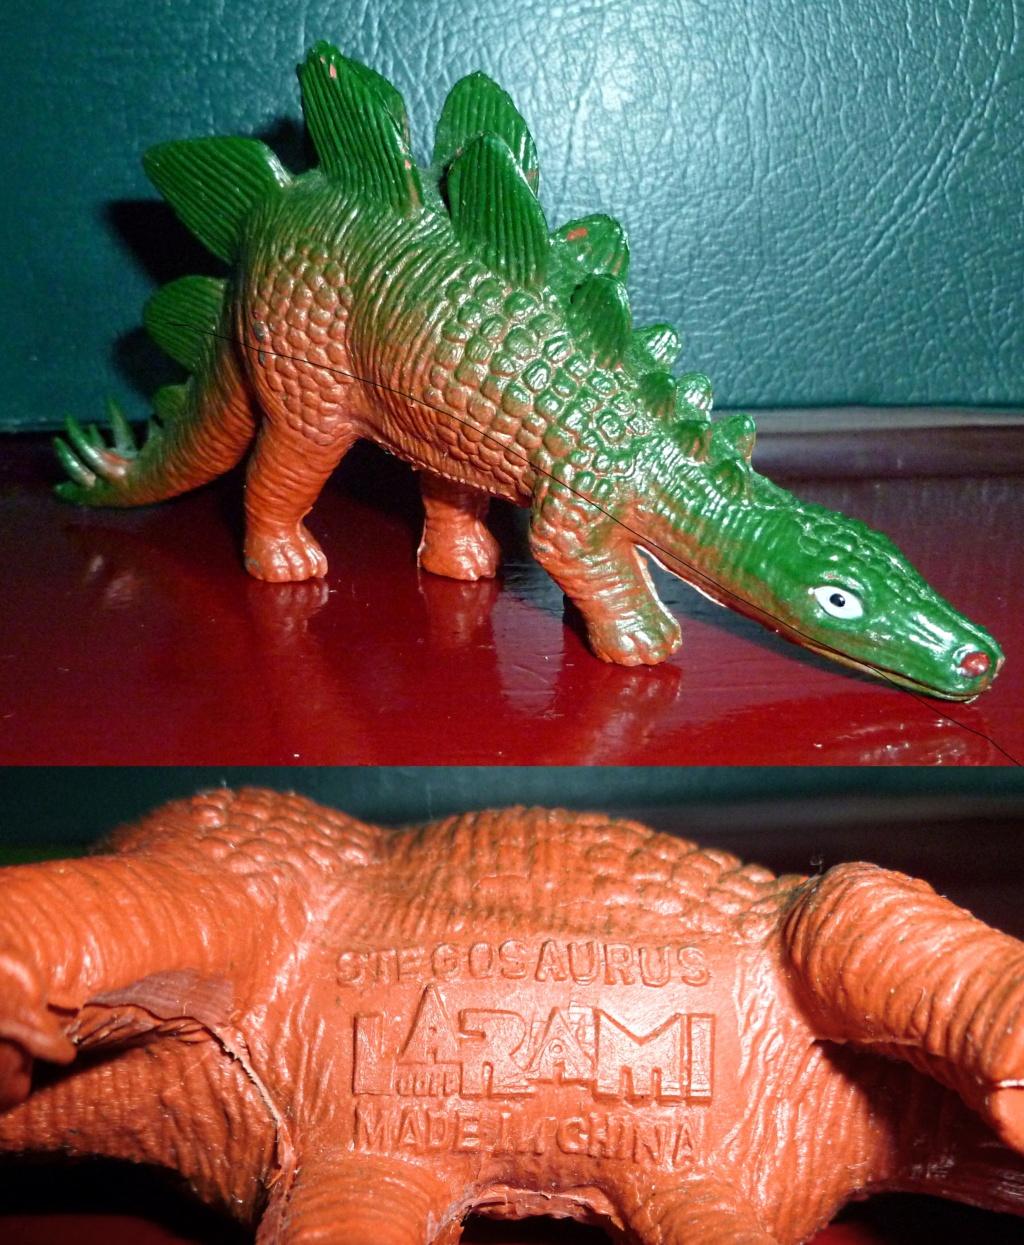 My Dinosaur figure collection: Battat 10 Dinosaur Set! - Page 2 Stegos14